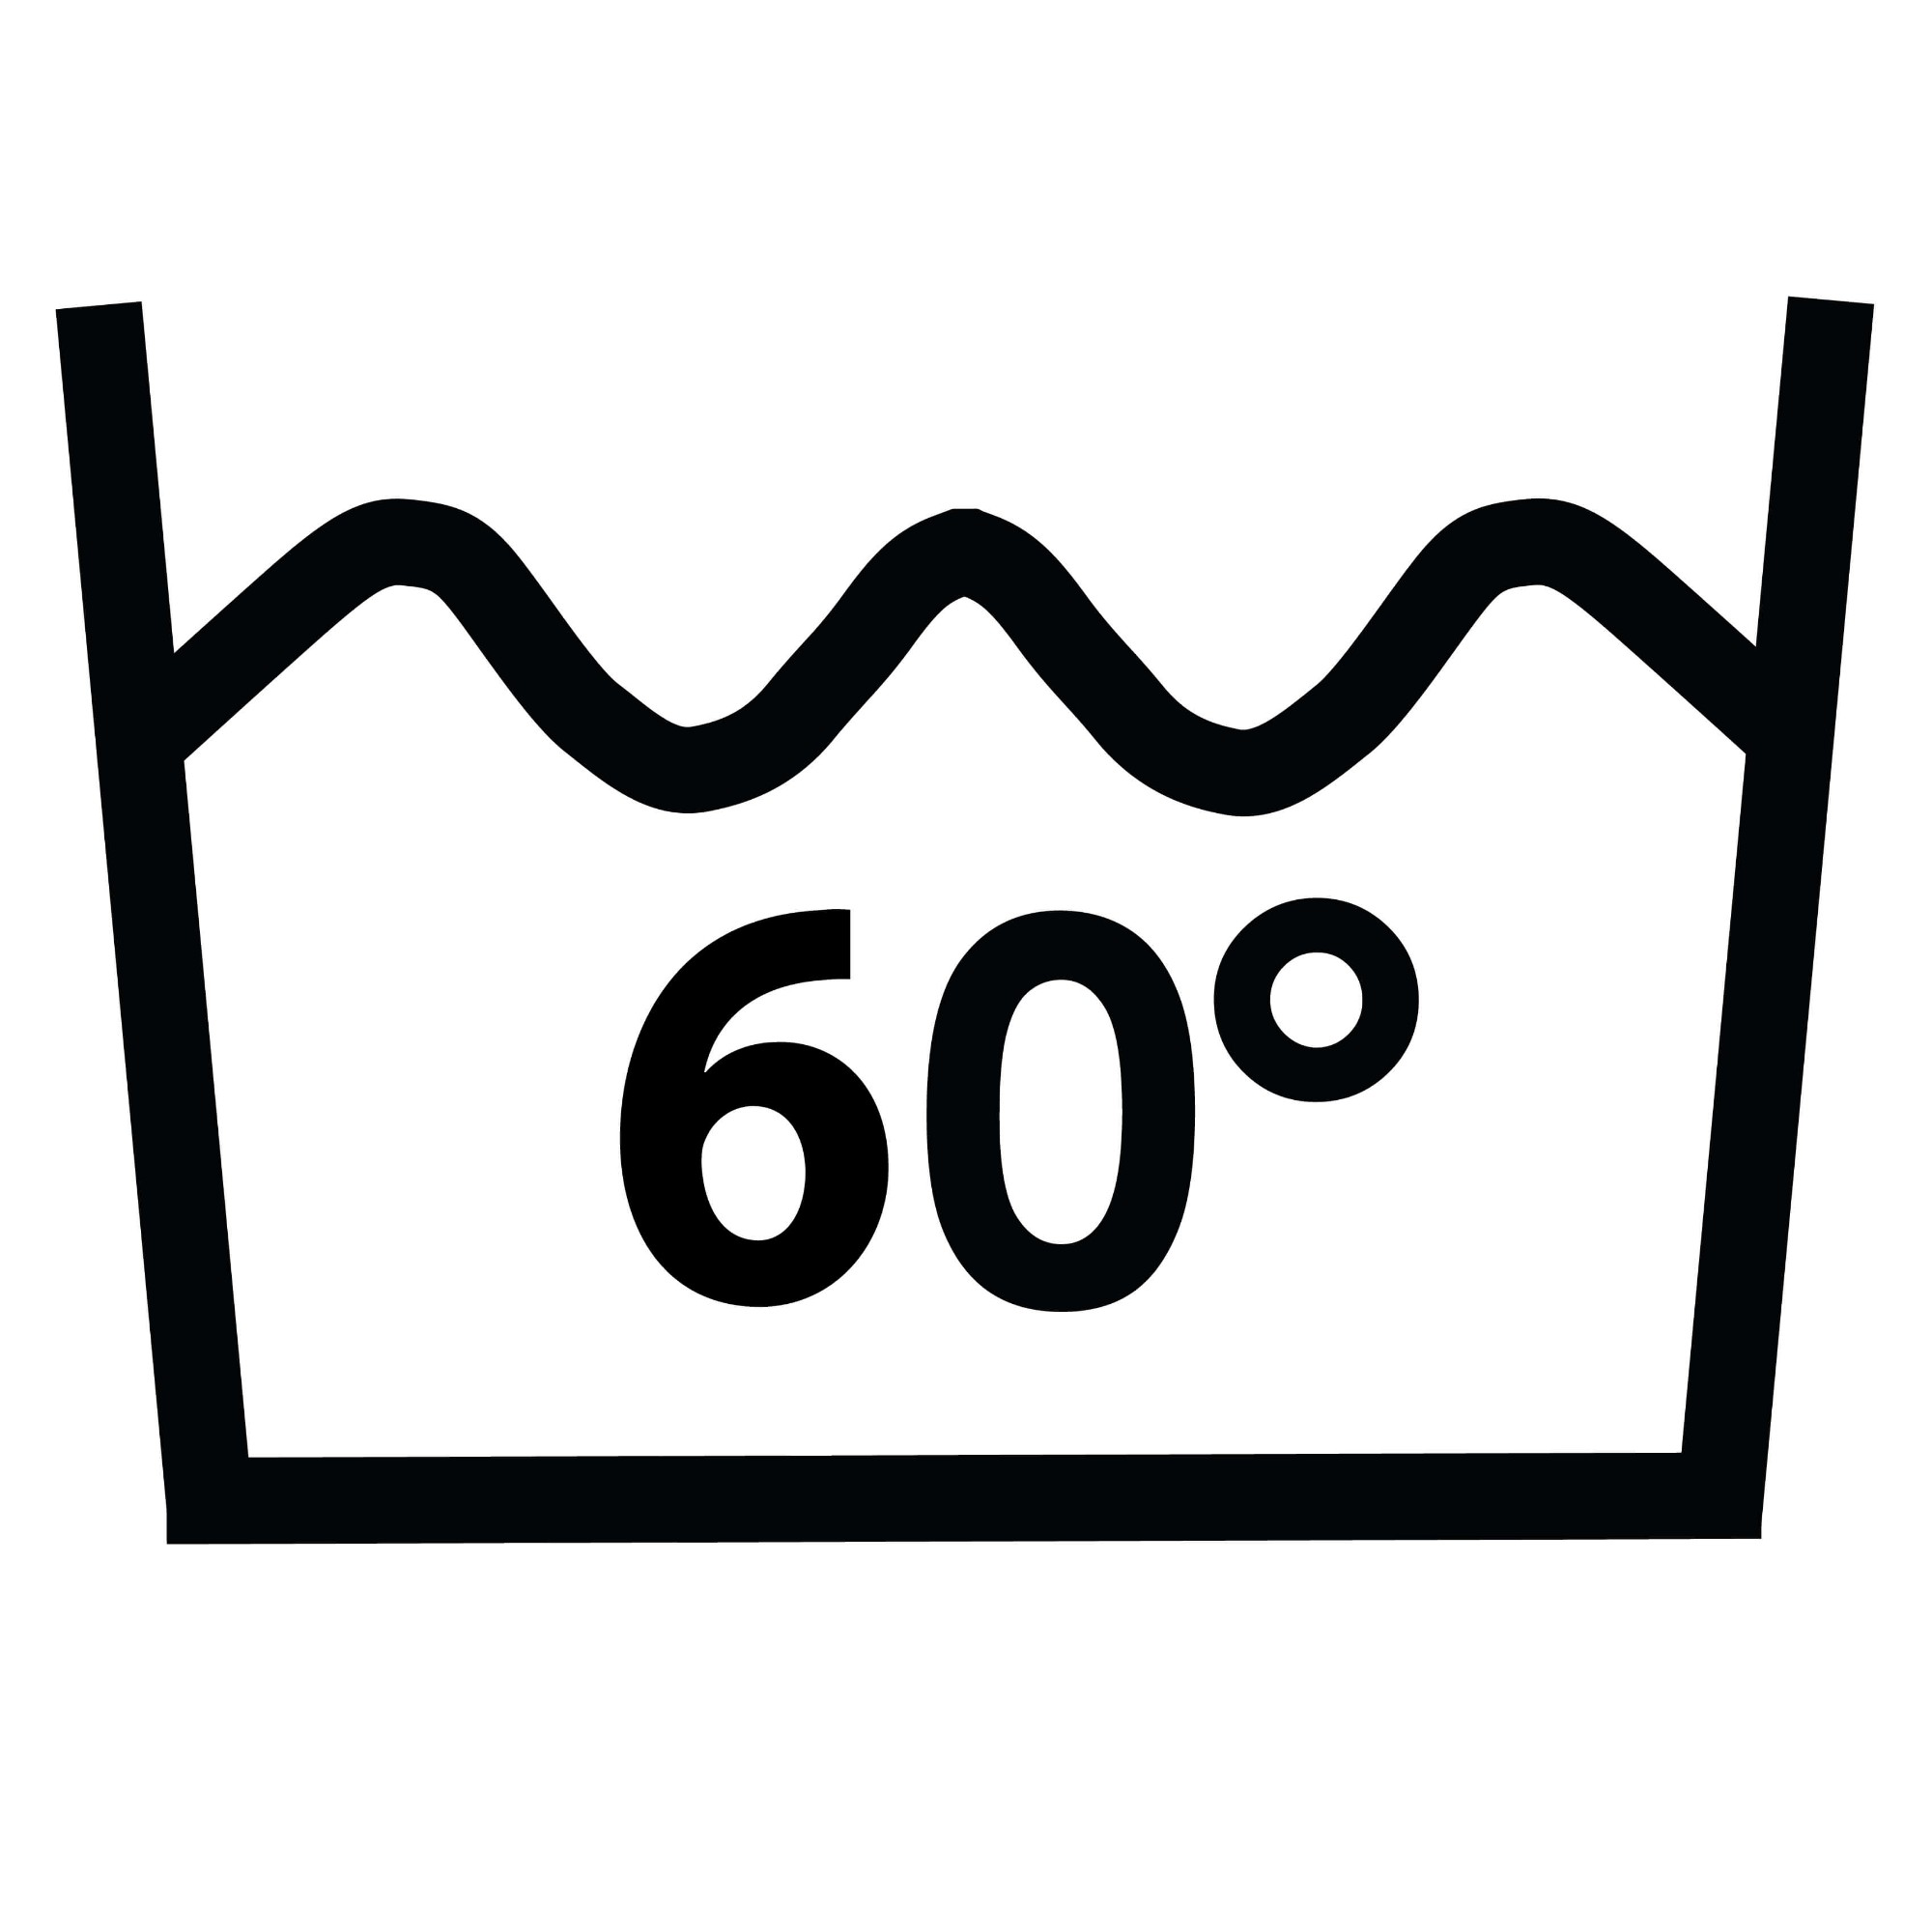 Veepesu kuni 60 °C